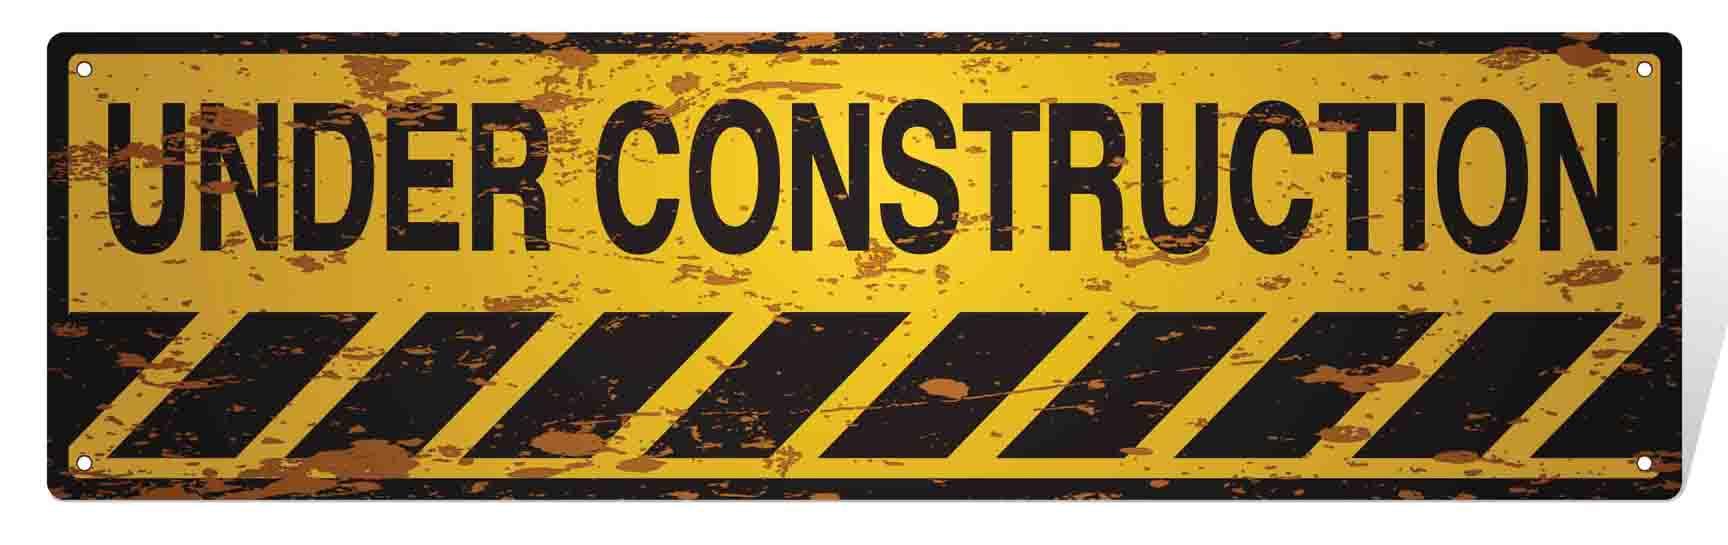 under-construction1